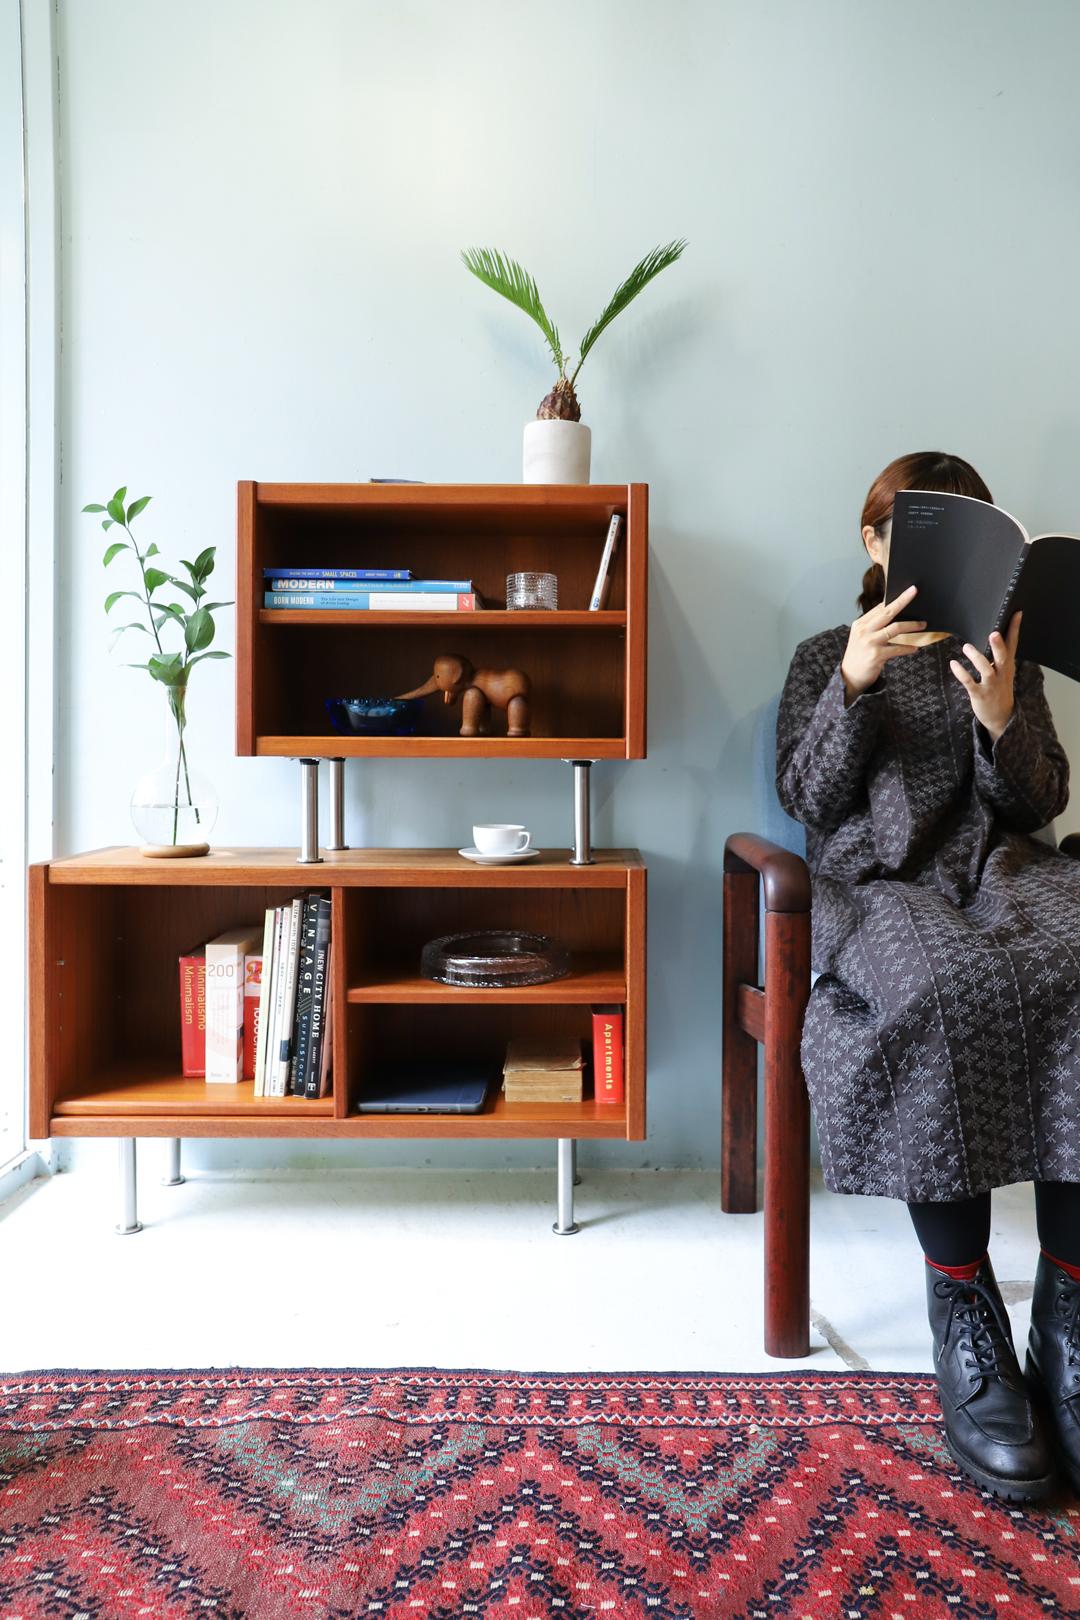 Japanese Vintage Teakwood Small Sideboard/ジャパンヴィンテージ スモールサイドボード テレビボード チーク材 北欧モダンデザイン